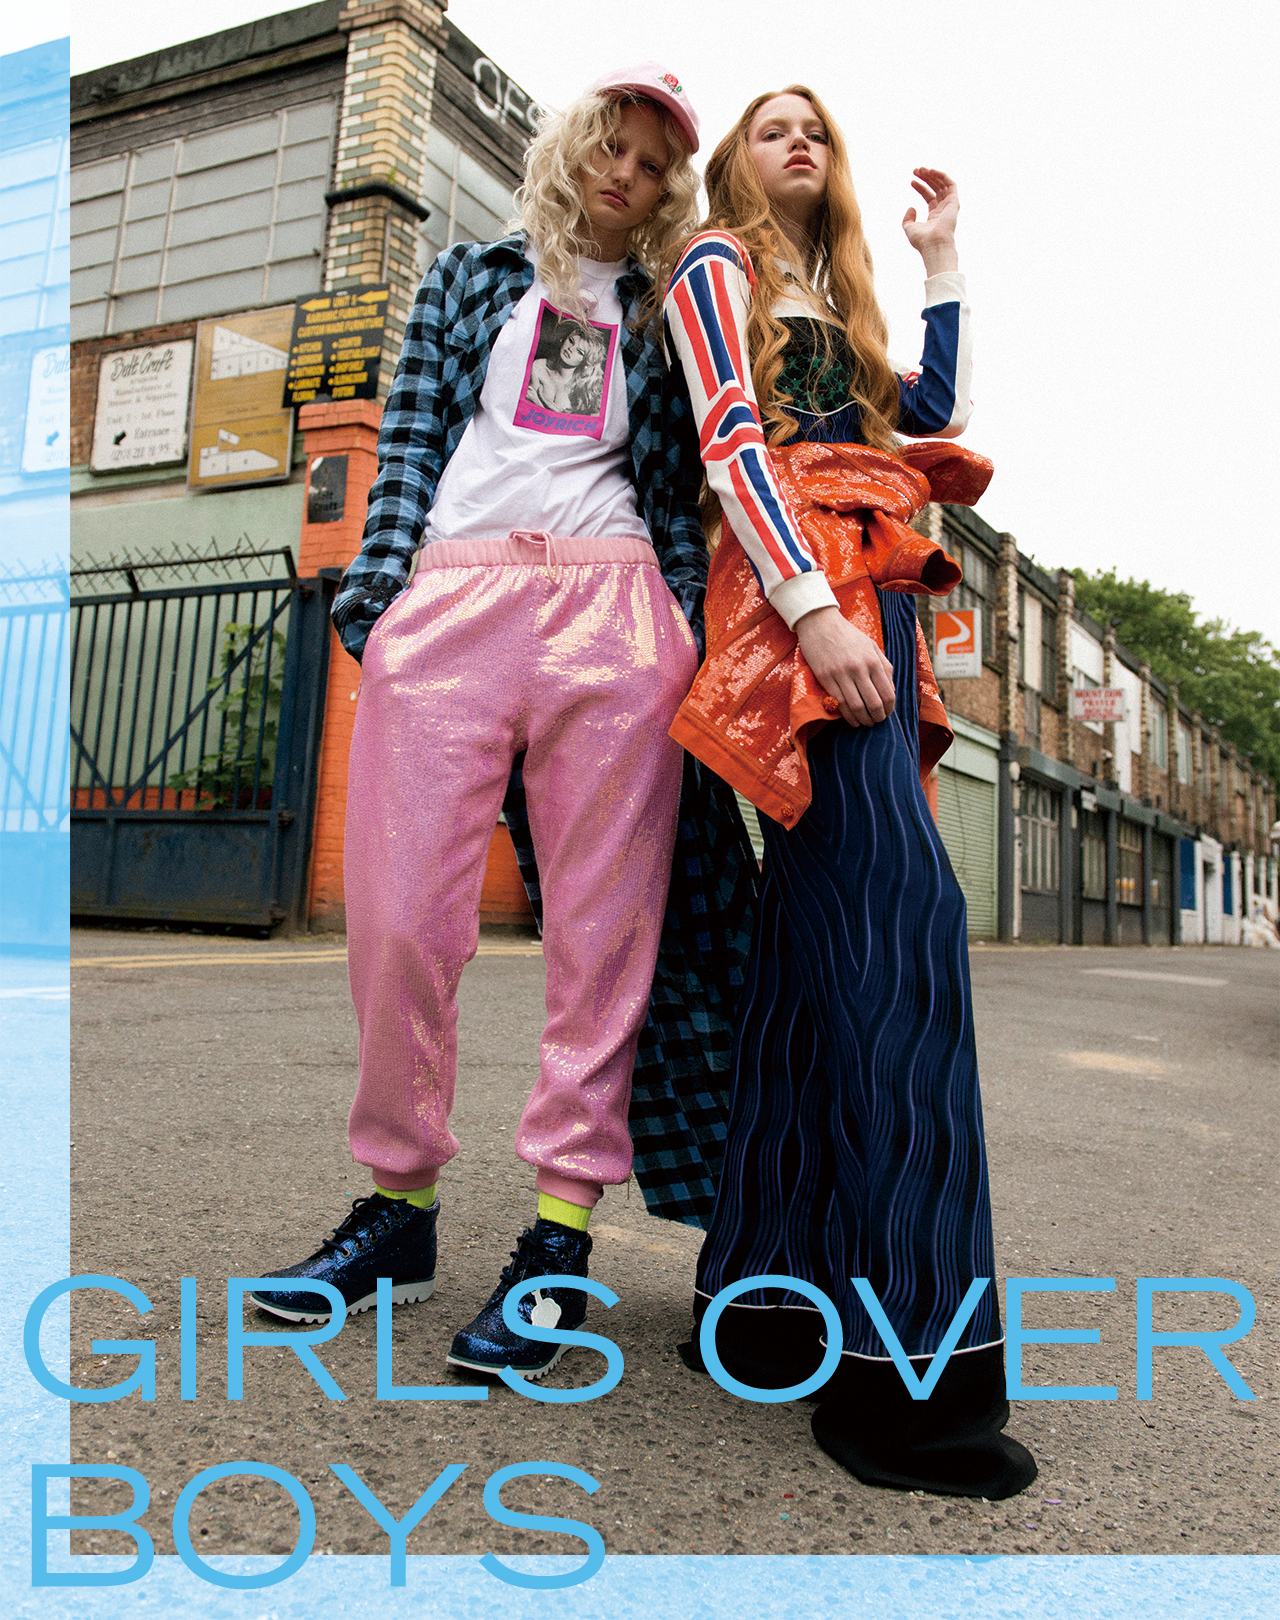 GIRLS OVER BOYS ジェンダーの垣根を超えるガールズパワー